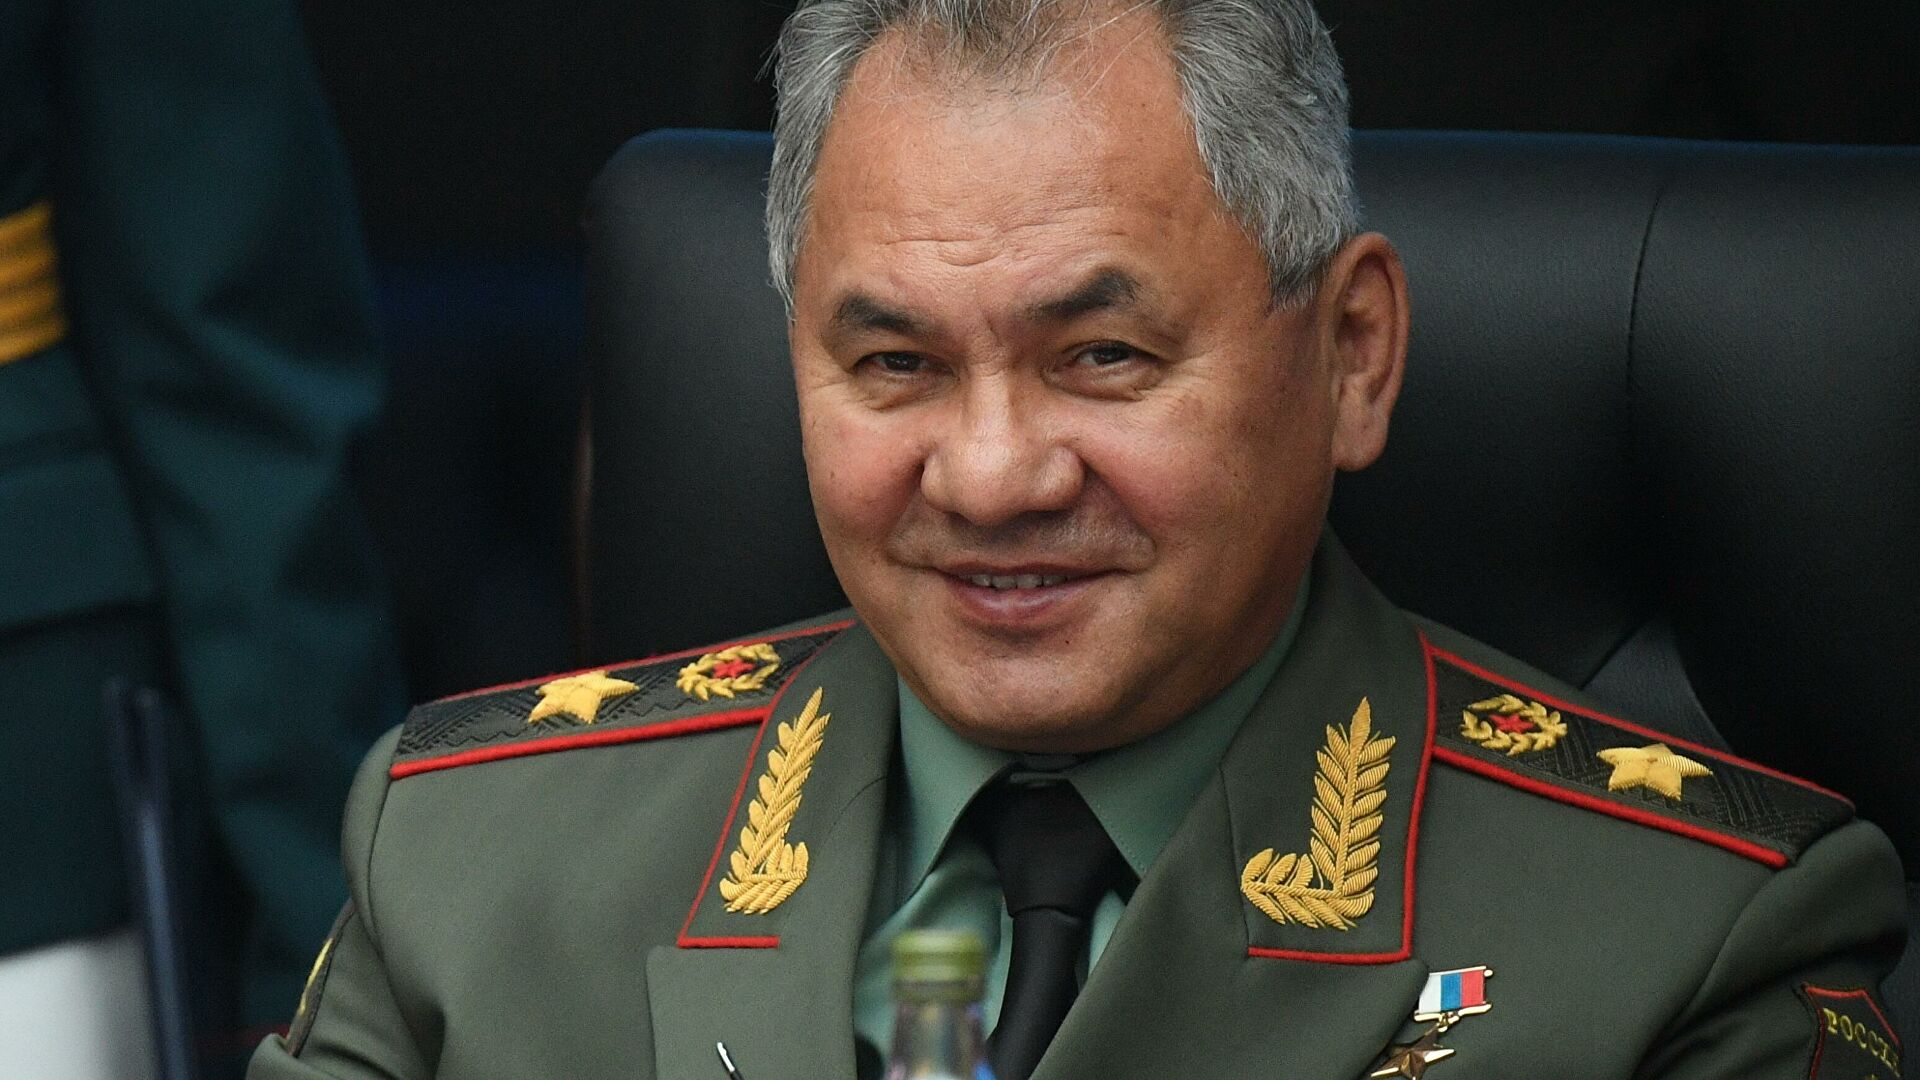 Министр обороны РФ Сергей Шойгу - Галерея - ВПК.name